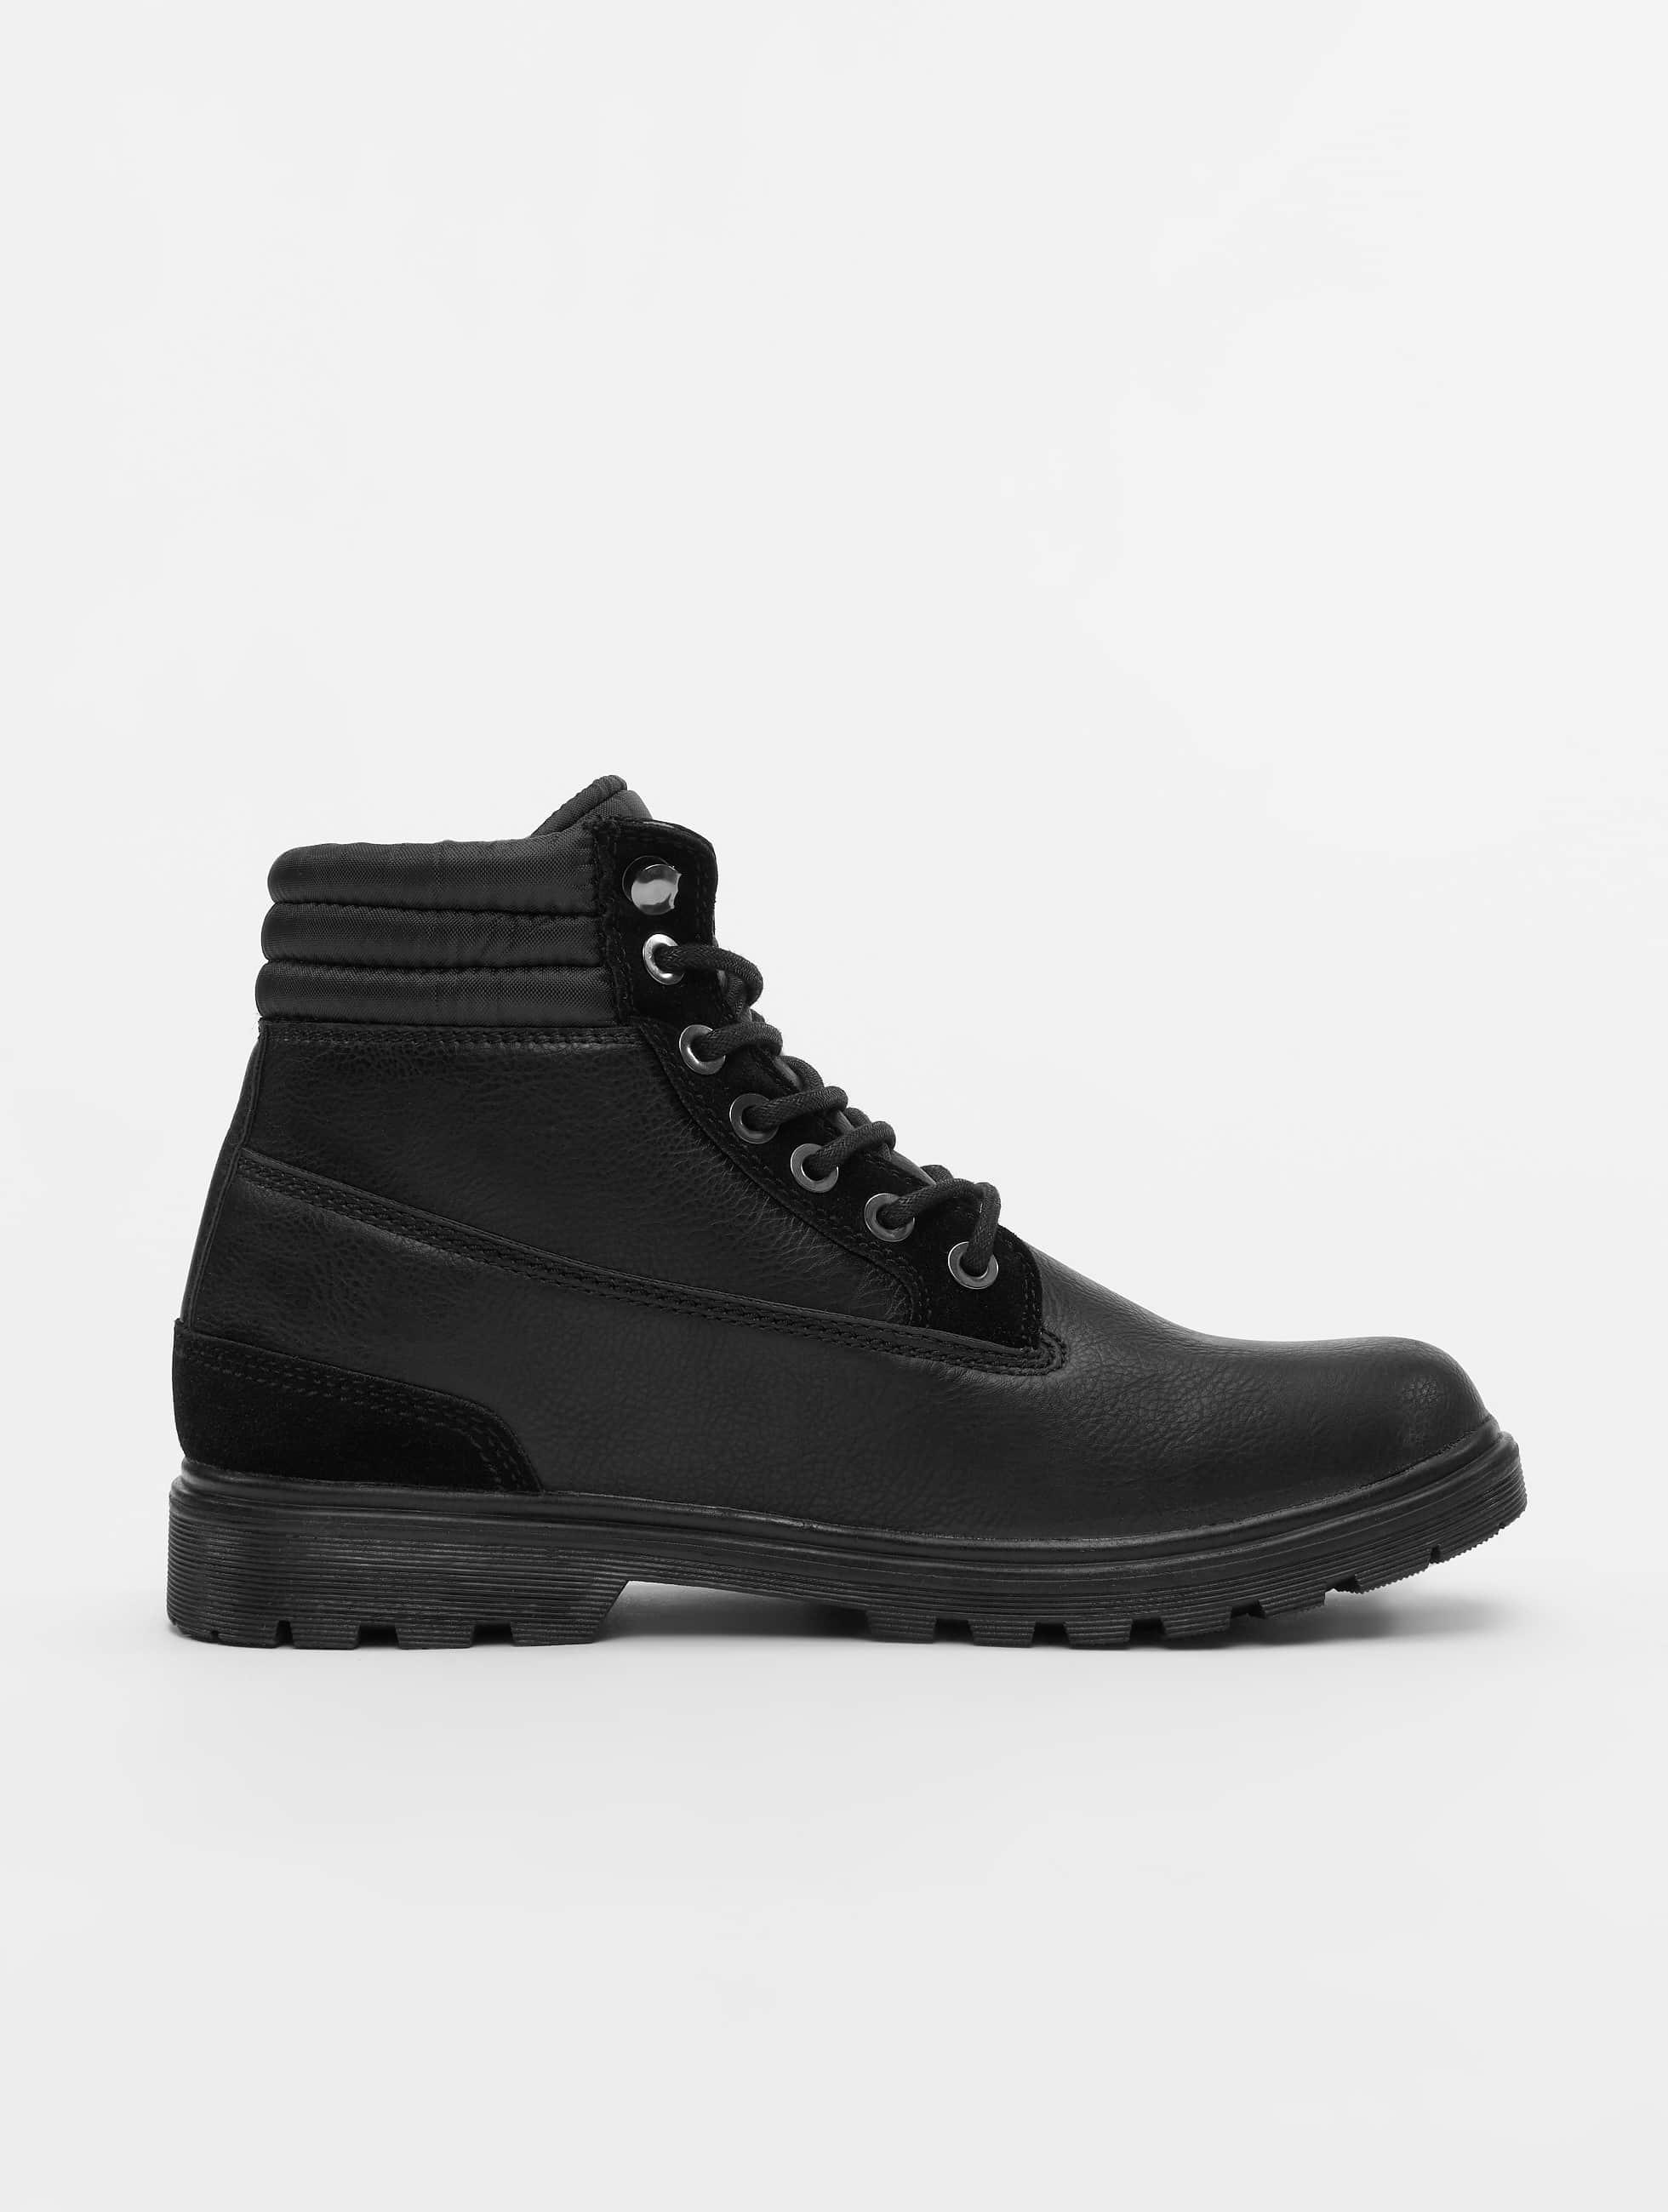 Urban Classics Boots Winter schwarz